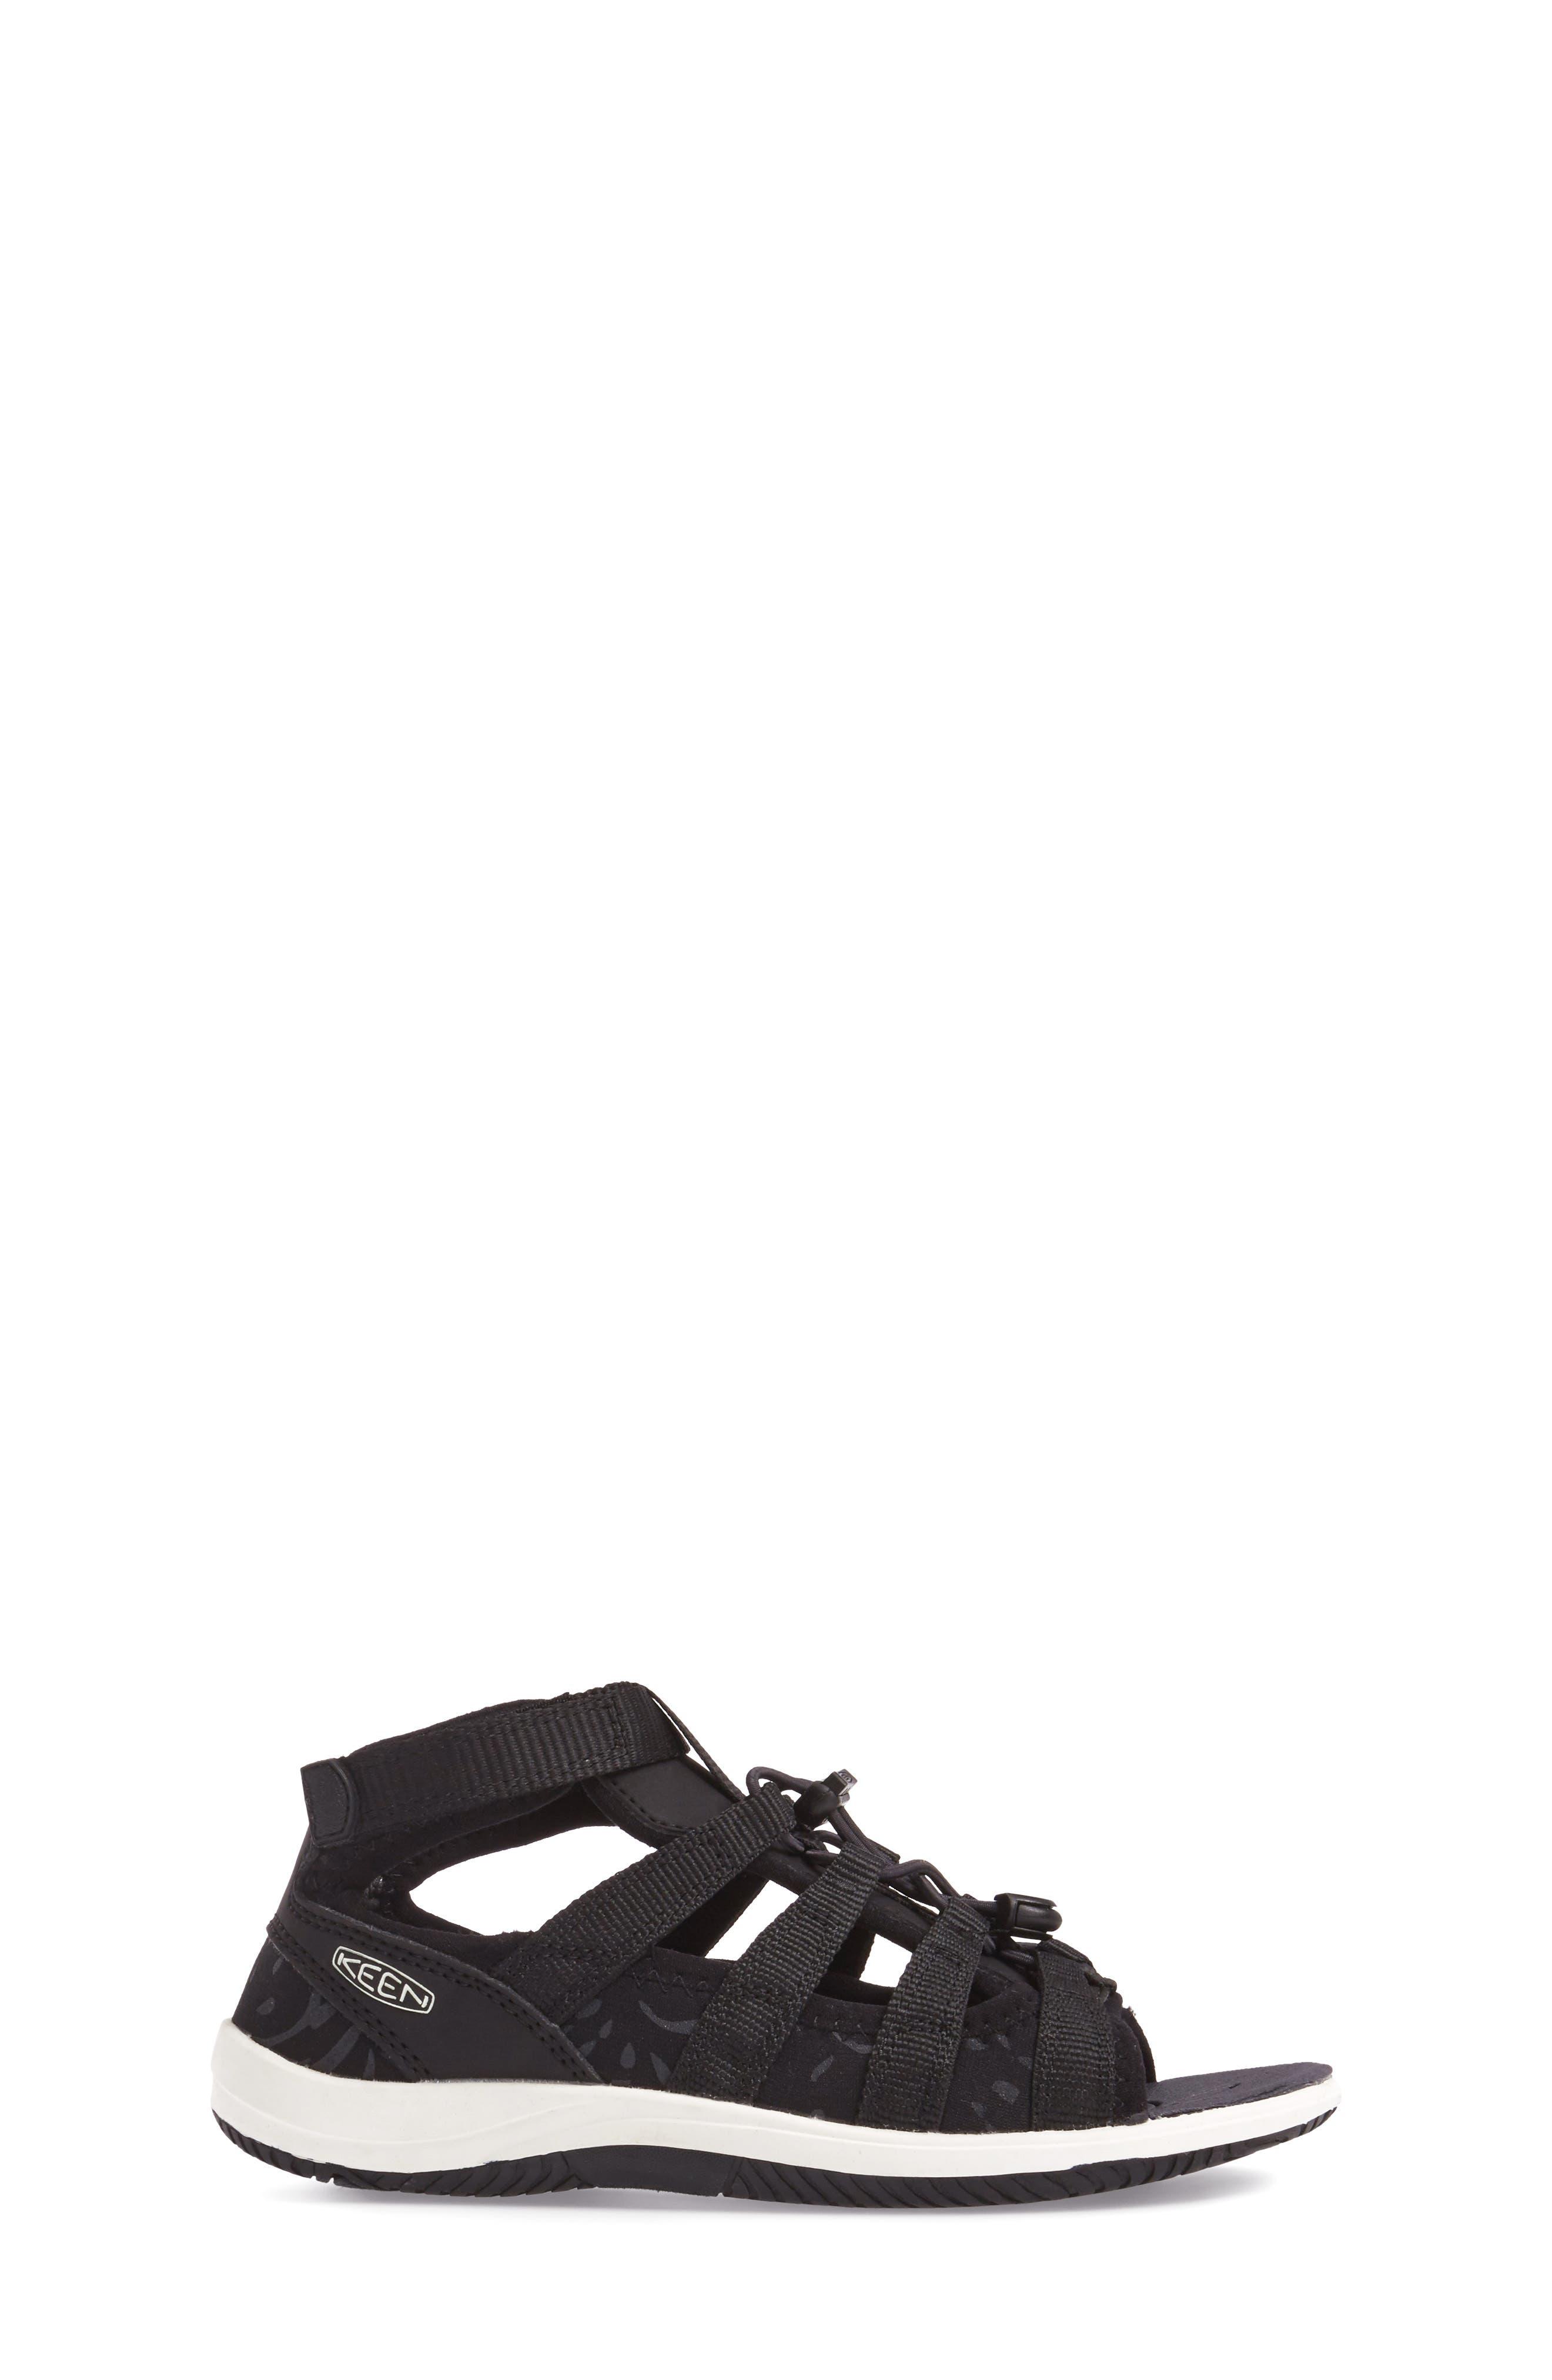 Hadley Adventure Water Friendly Sandal,                             Alternate thumbnail 3, color,                             Black/ White